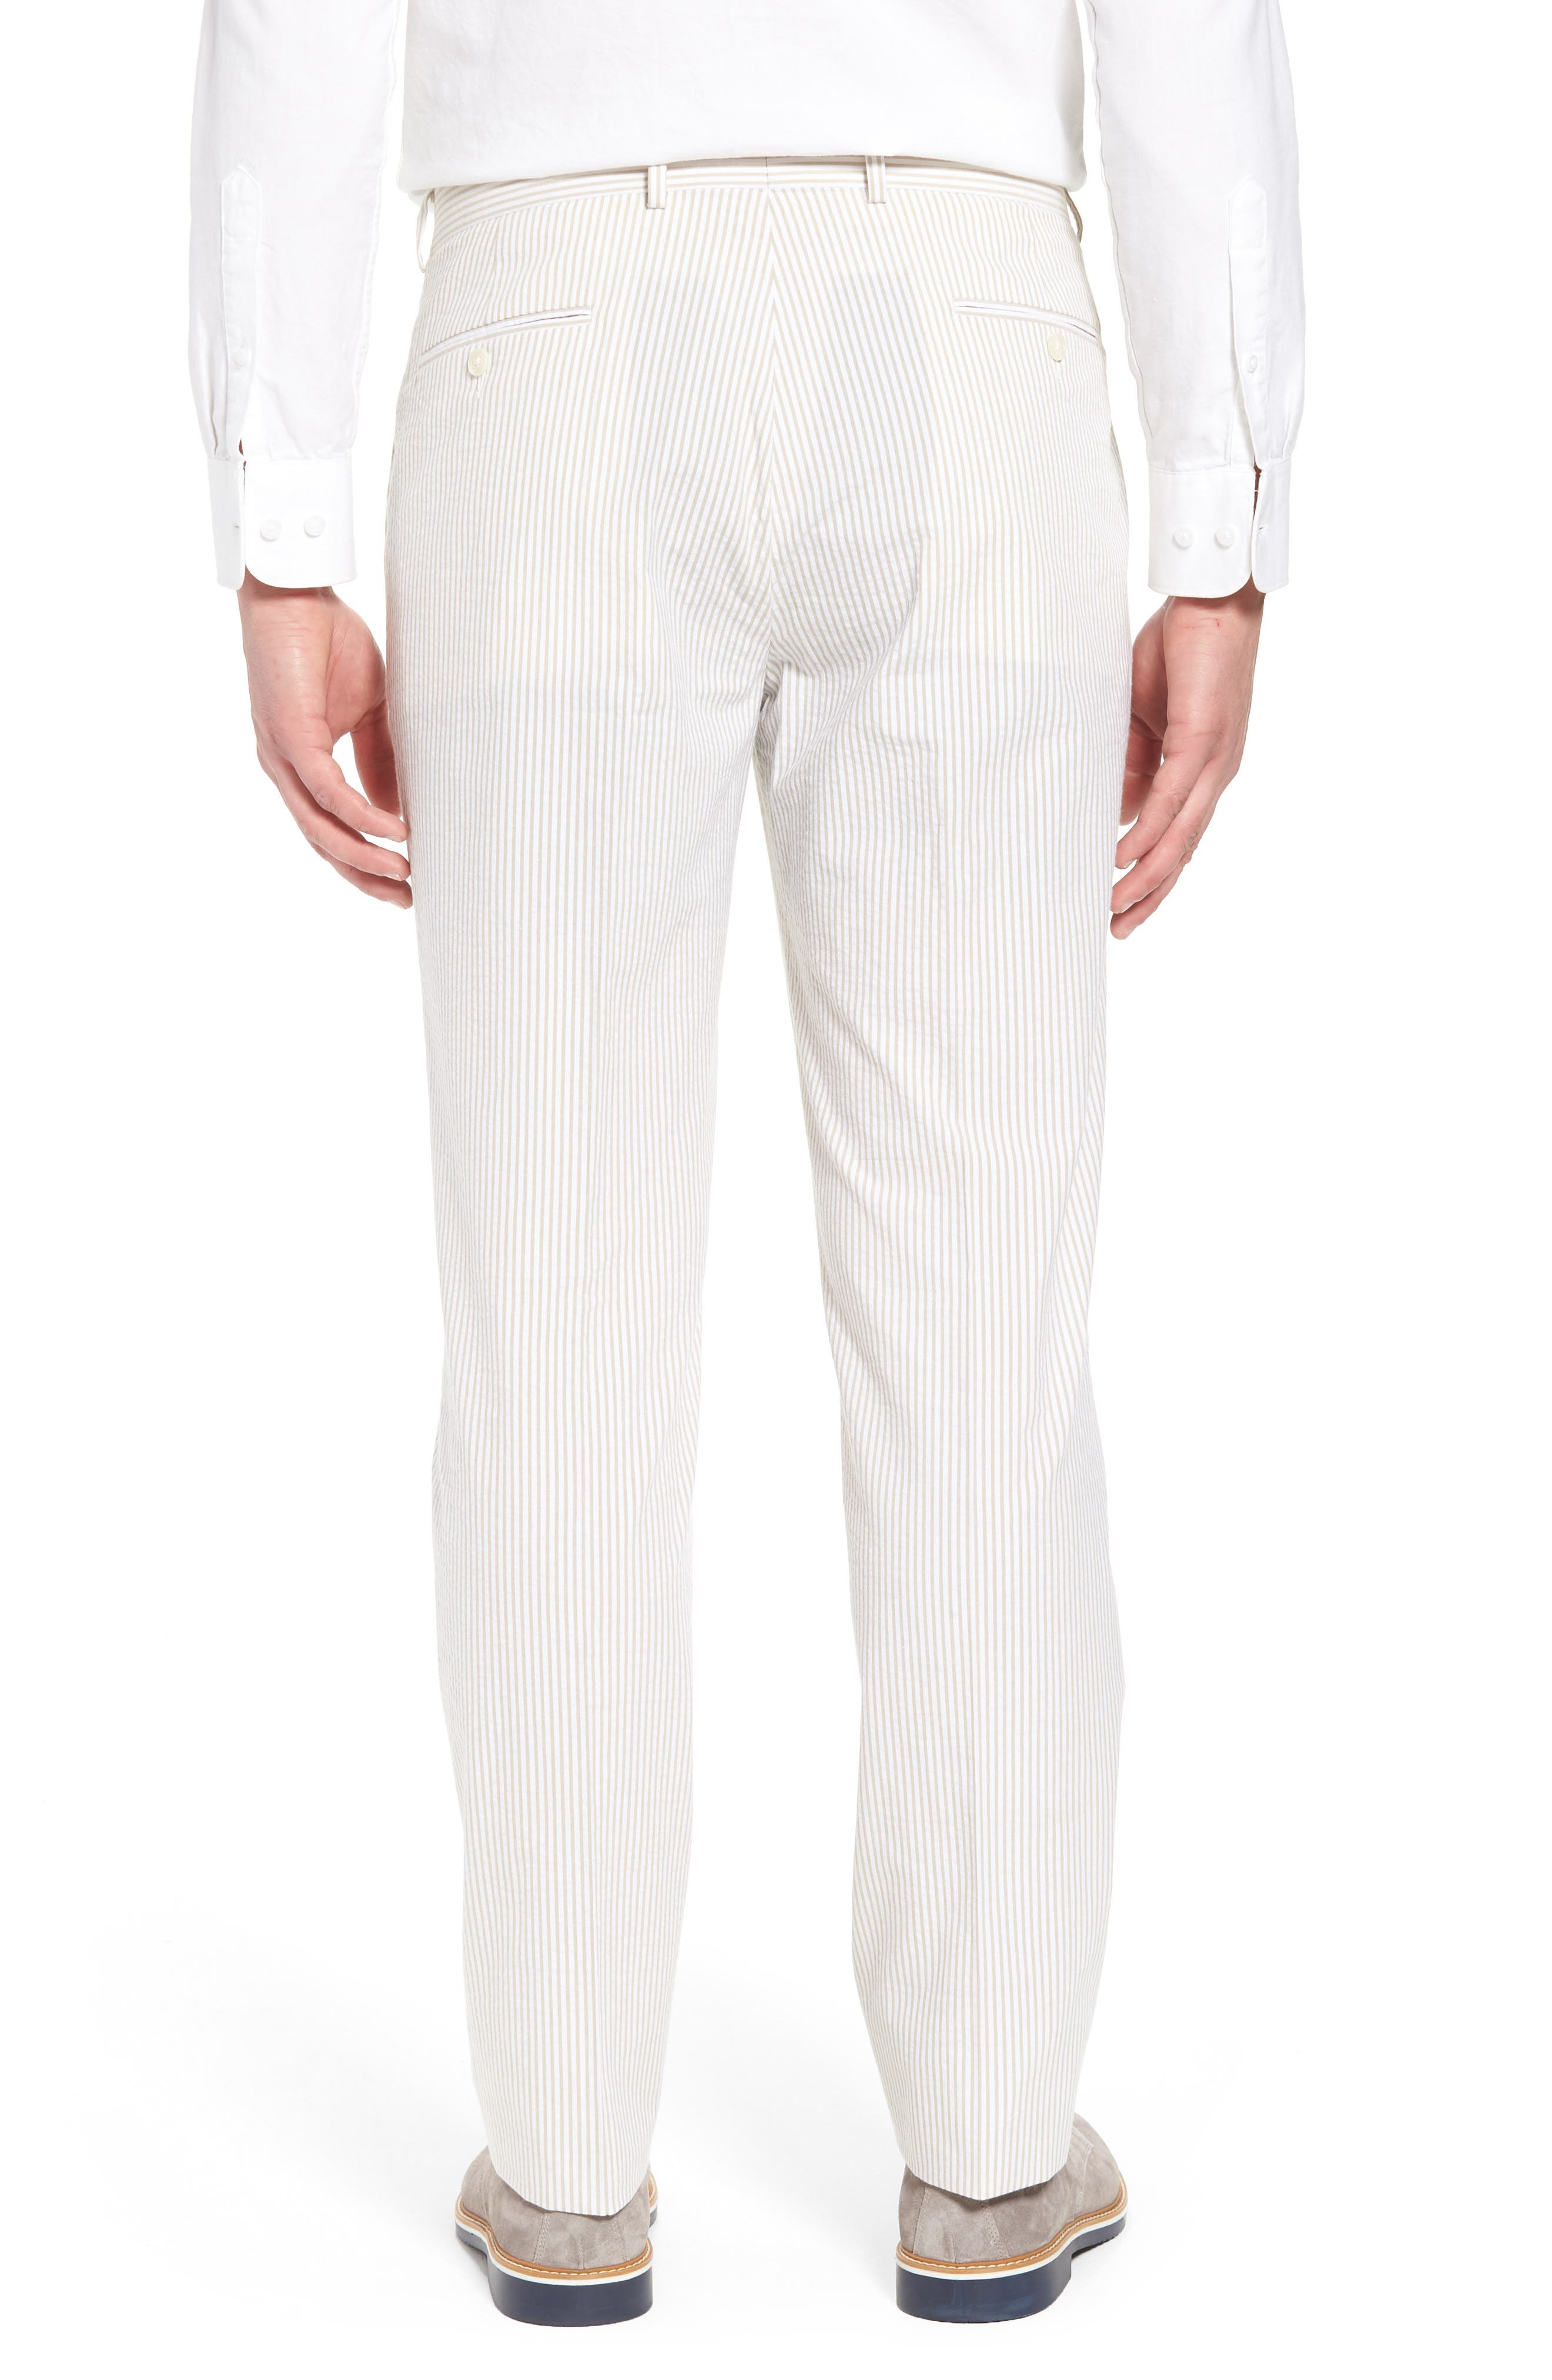 Andrew AIM Flat Front Seersucker Trousers,                             Alternate thumbnail 2, color,                             250